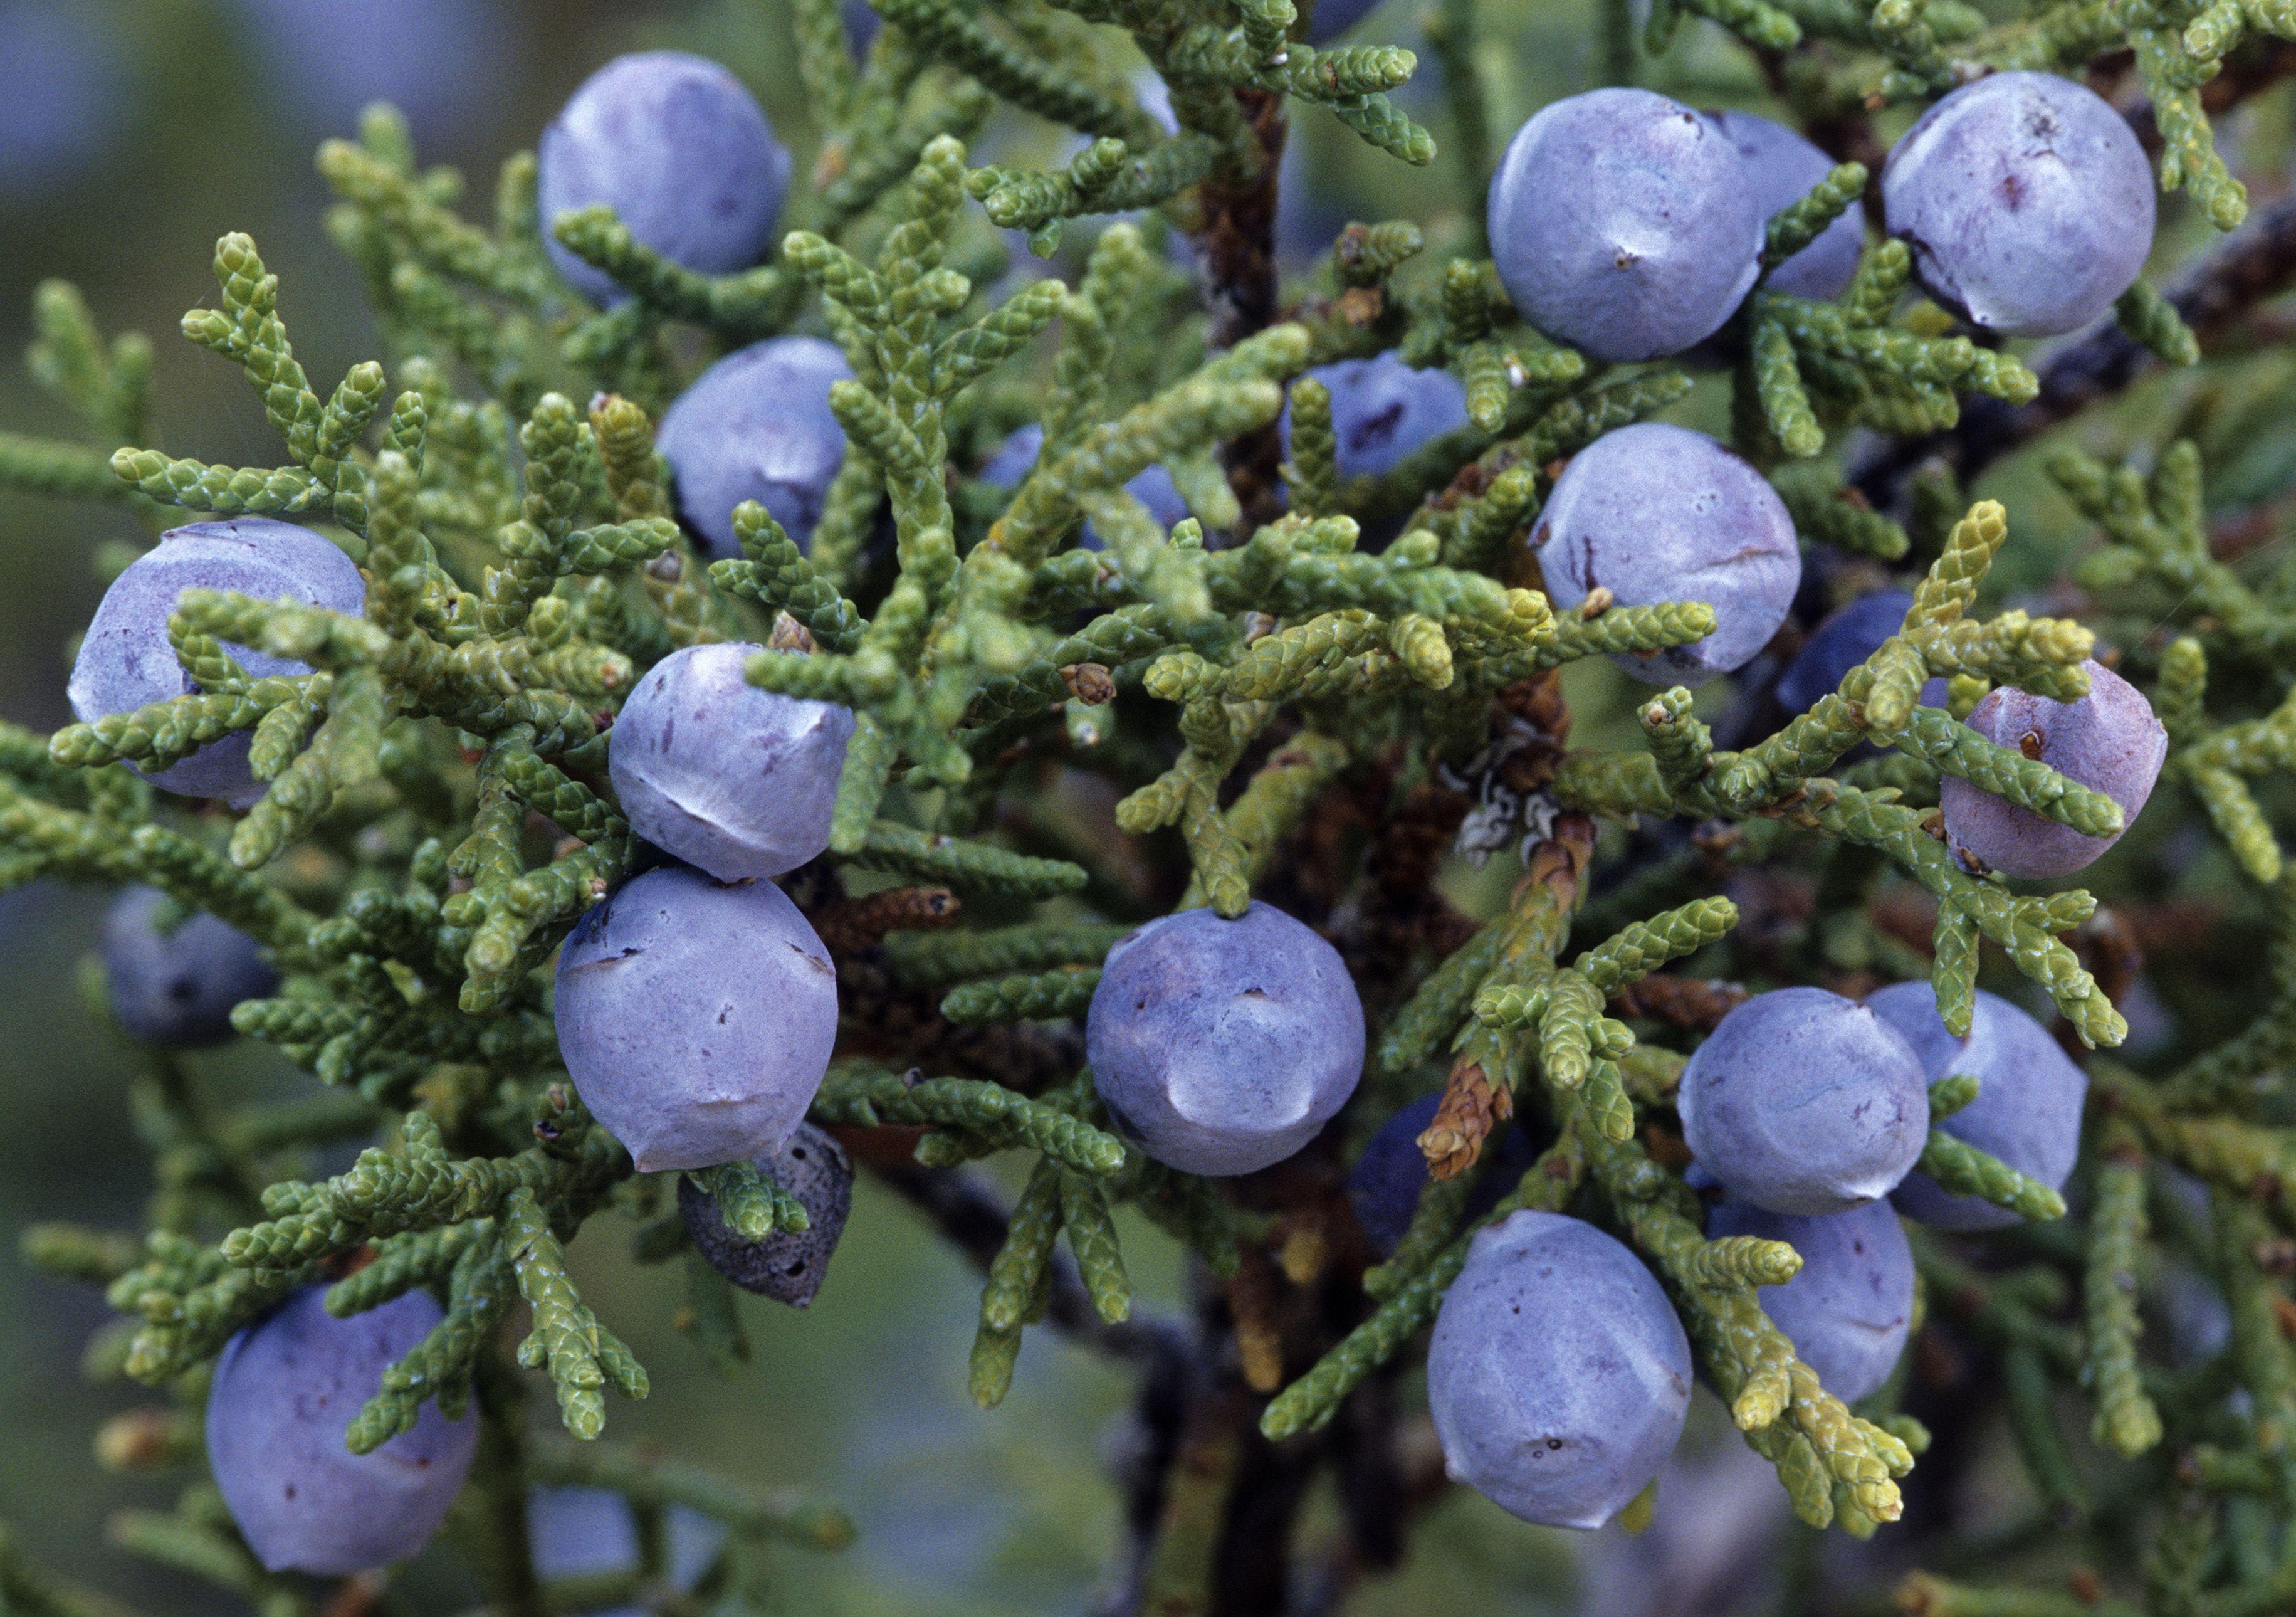 Rocky Mountain Juniper with juniper berries. Juniperus scopulorum. Semi-fleshy, bluish cones. Found widely throughout the Rocky Mountain region. Zion National Park, Utah. USA